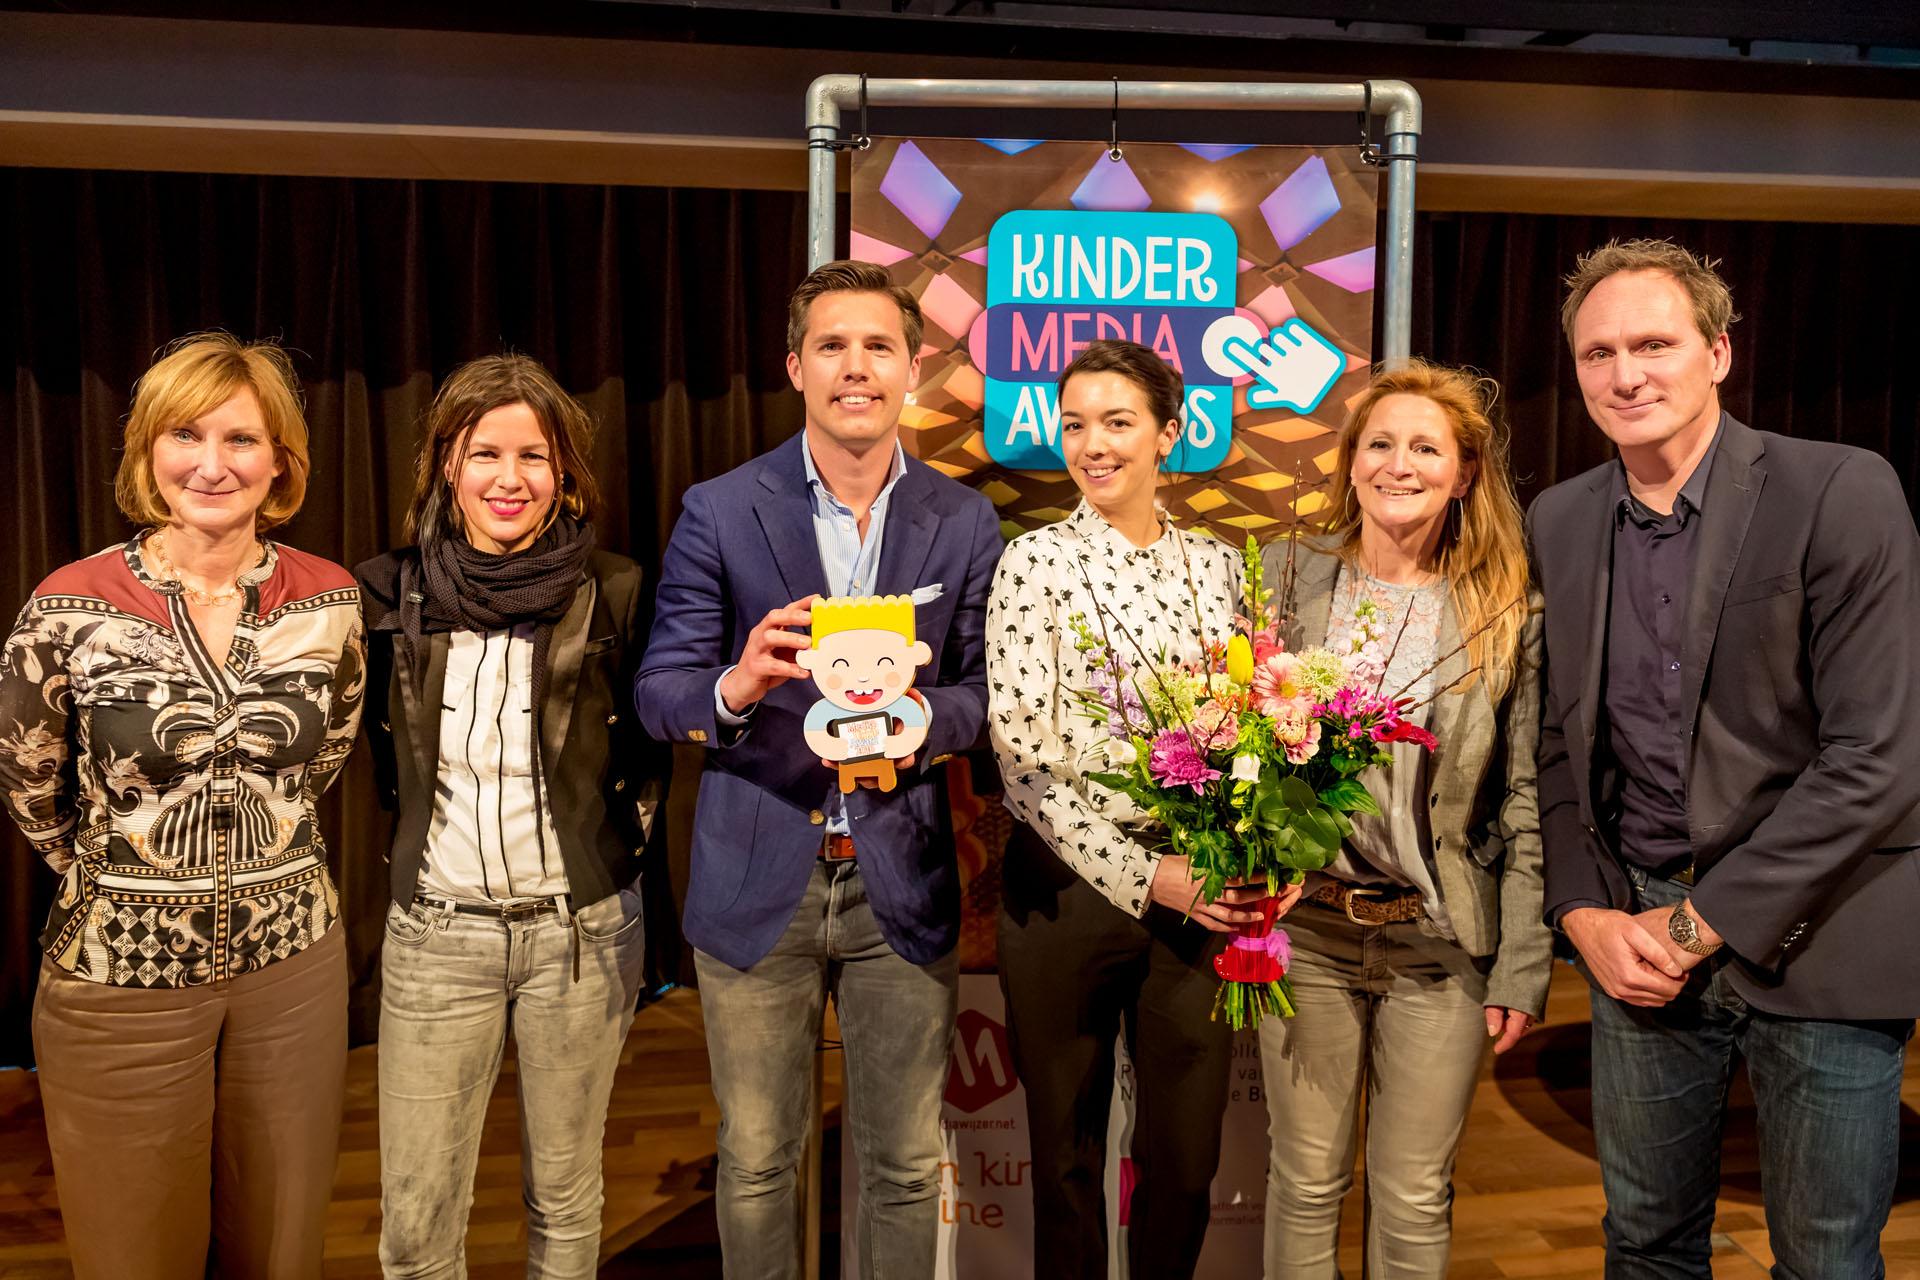 Media Ukkie Award Kinder Media Awards